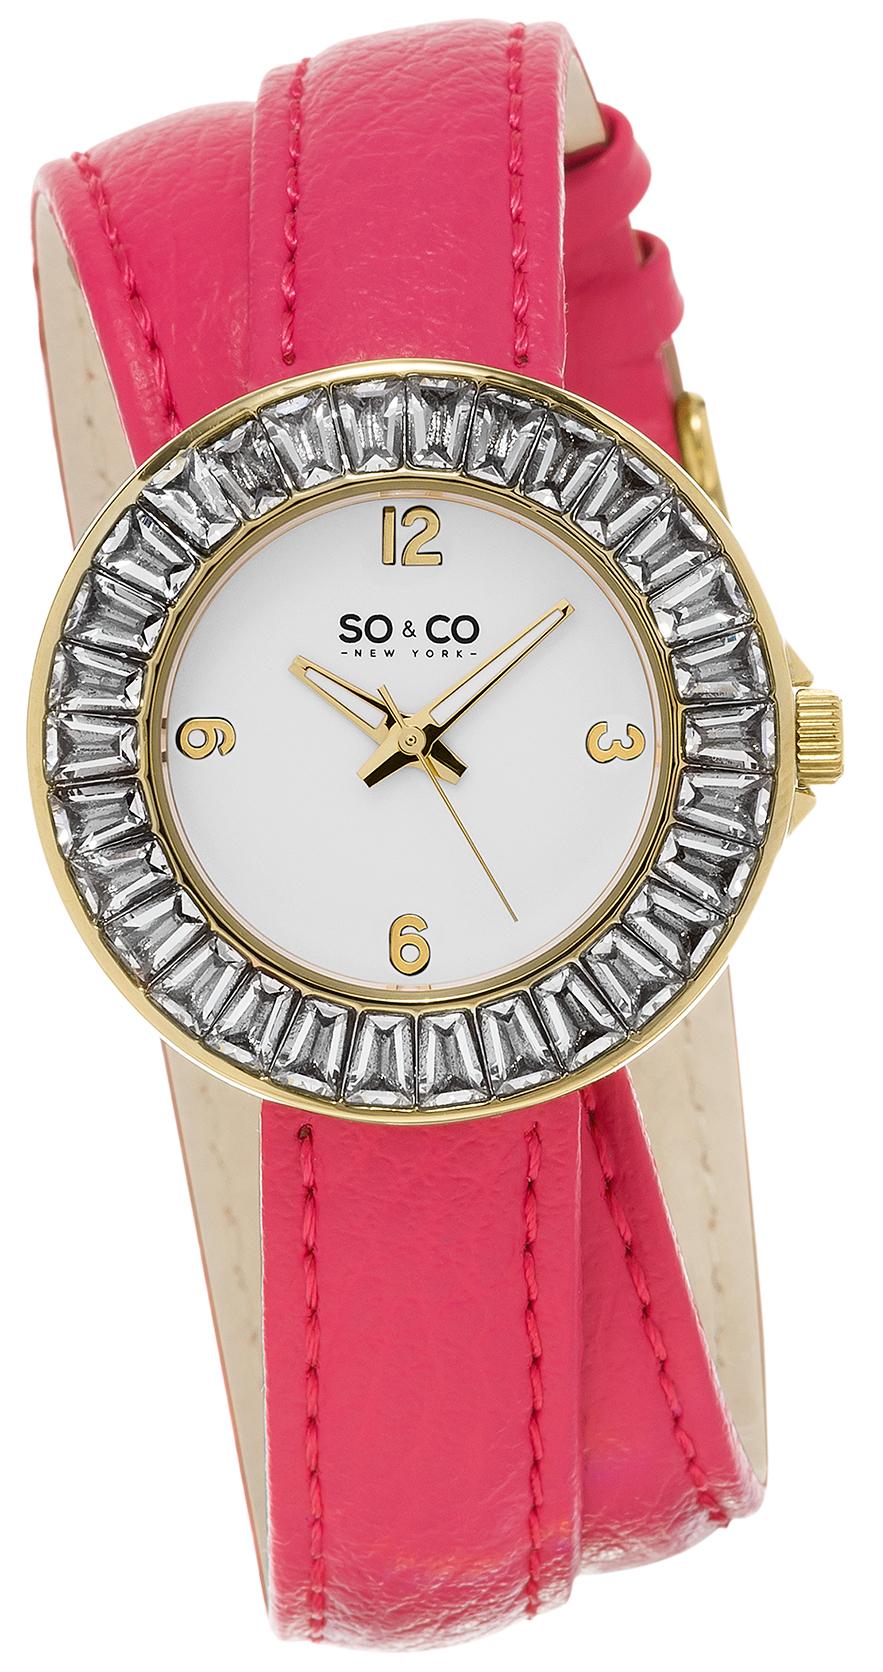 So & Co New York SoHo Damklocka 5070.3 Vit/Läder Ø34 mm - So & Co New York